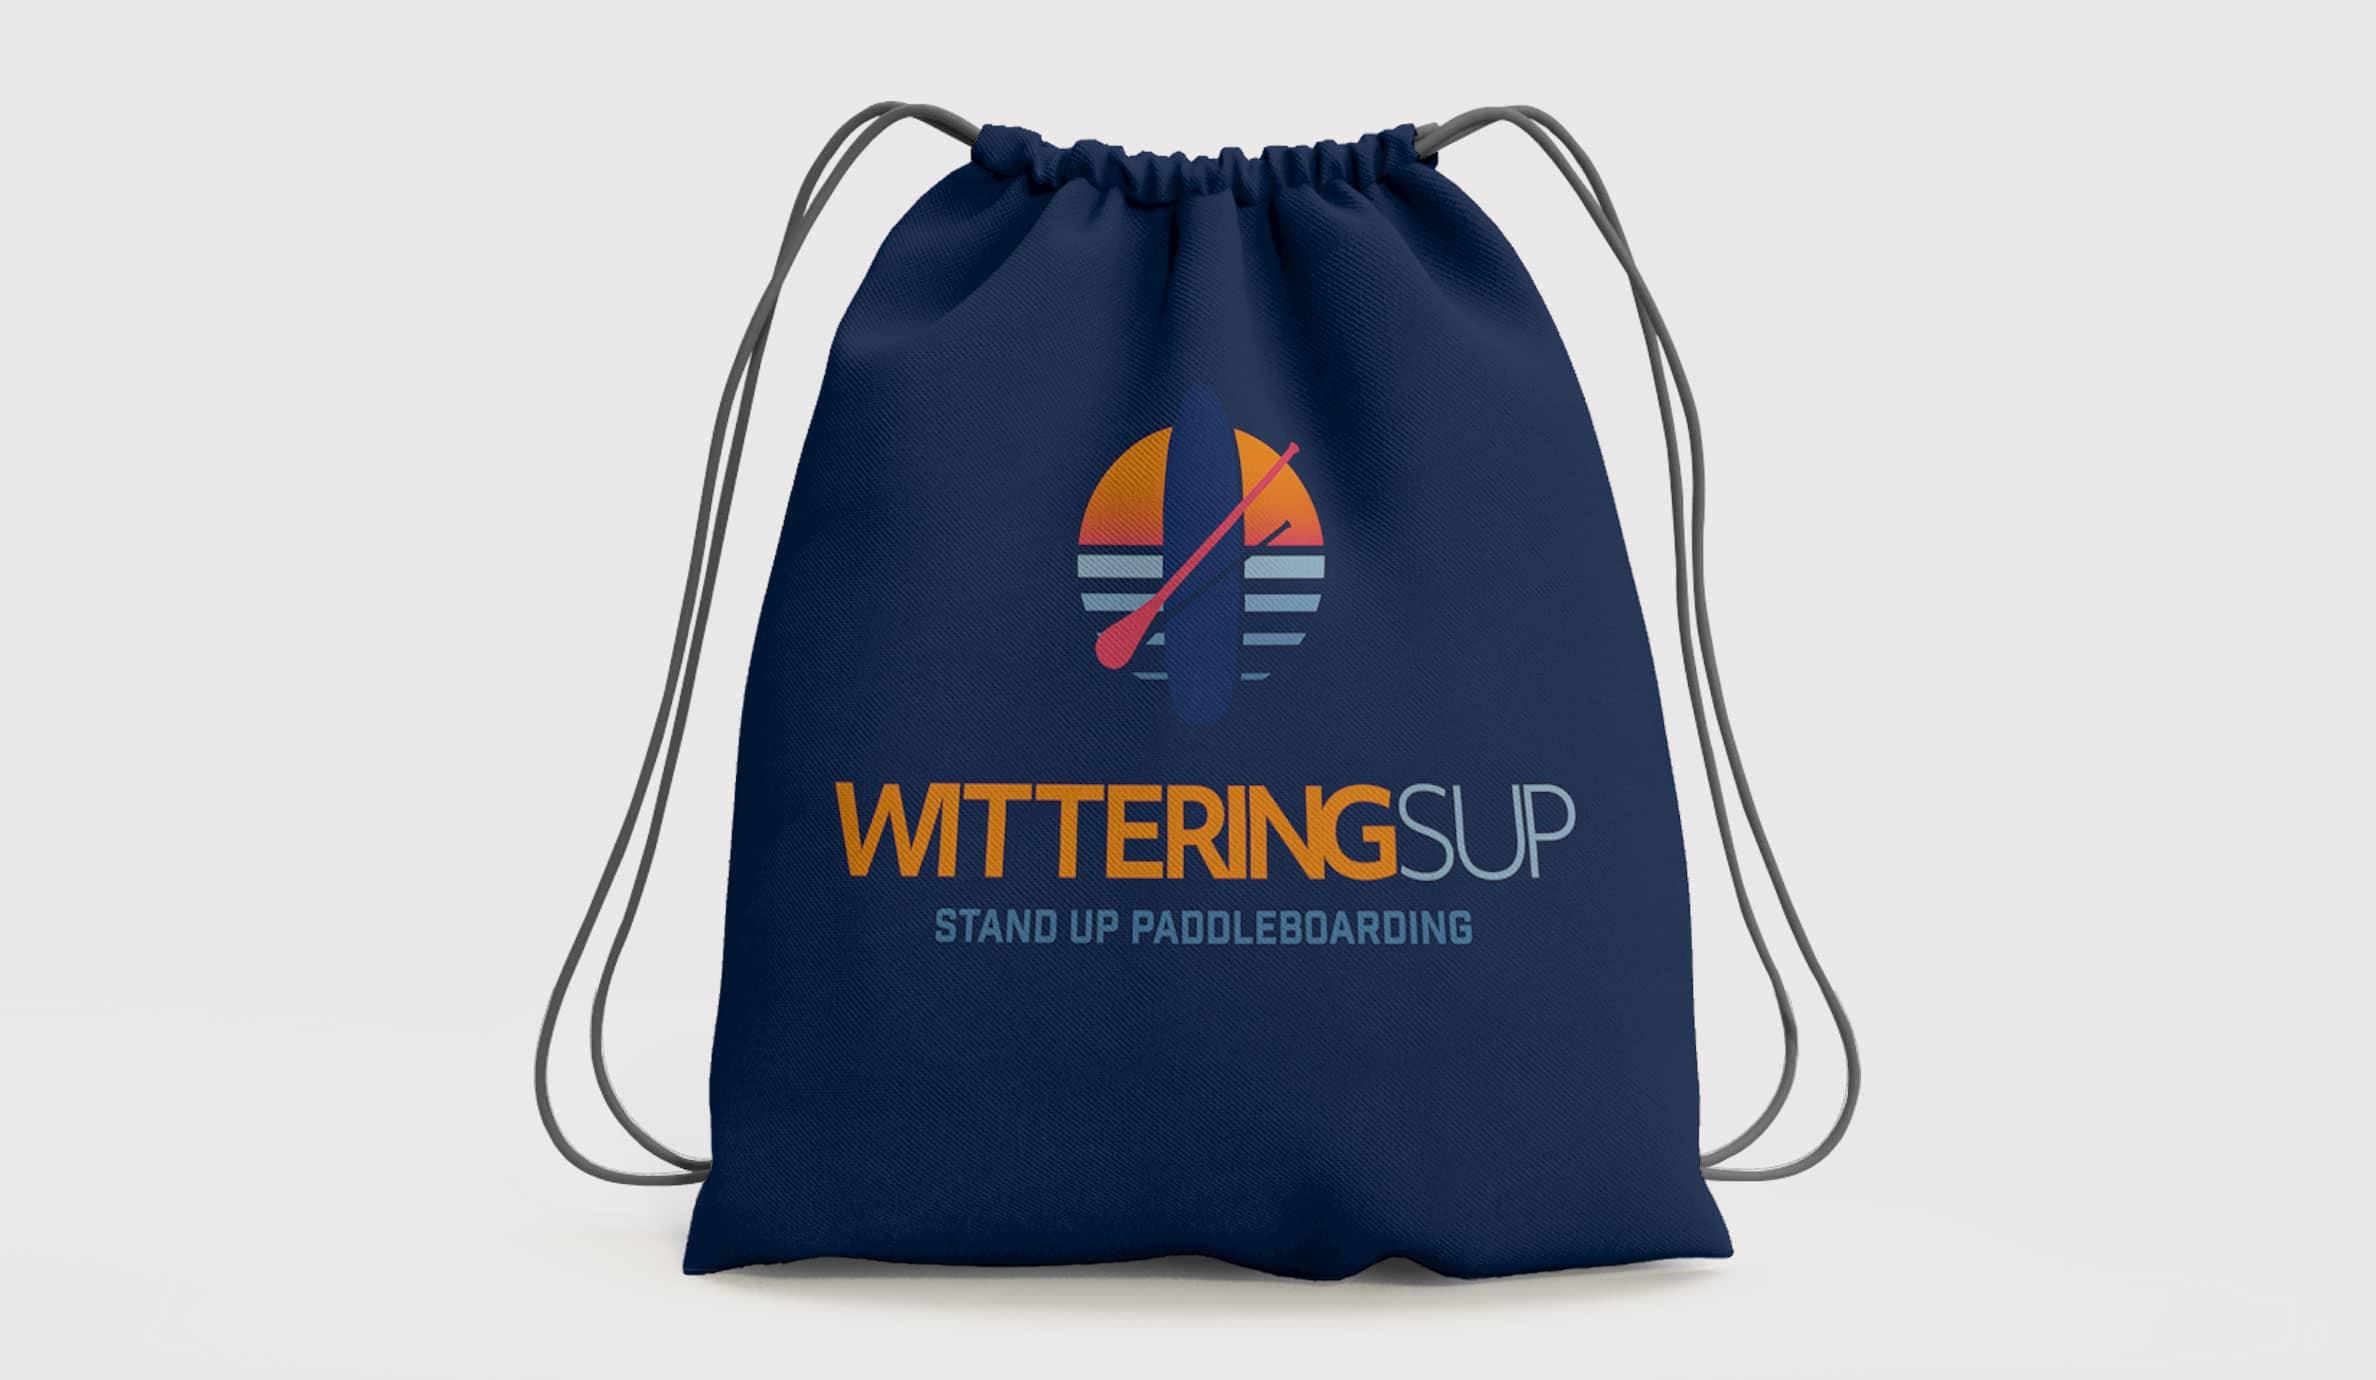 branded merchandise dark blue drawstring bag with wittering logo on